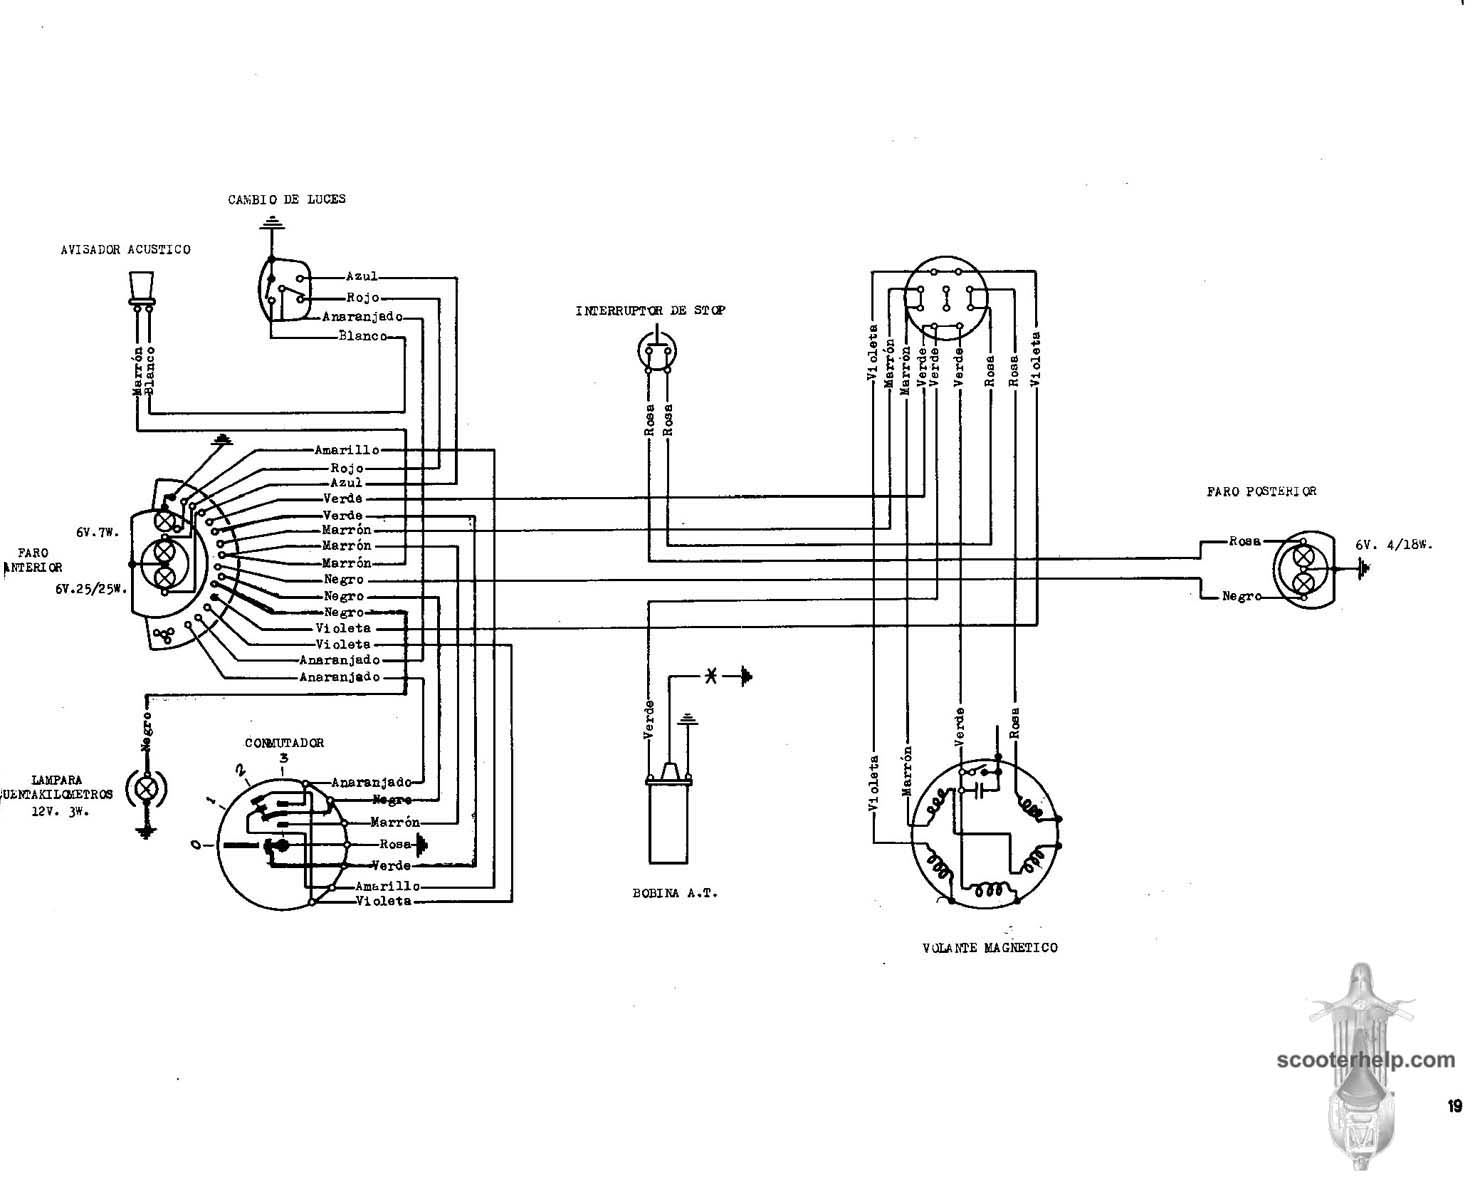 Serveta Jet 200 Owner's Manual